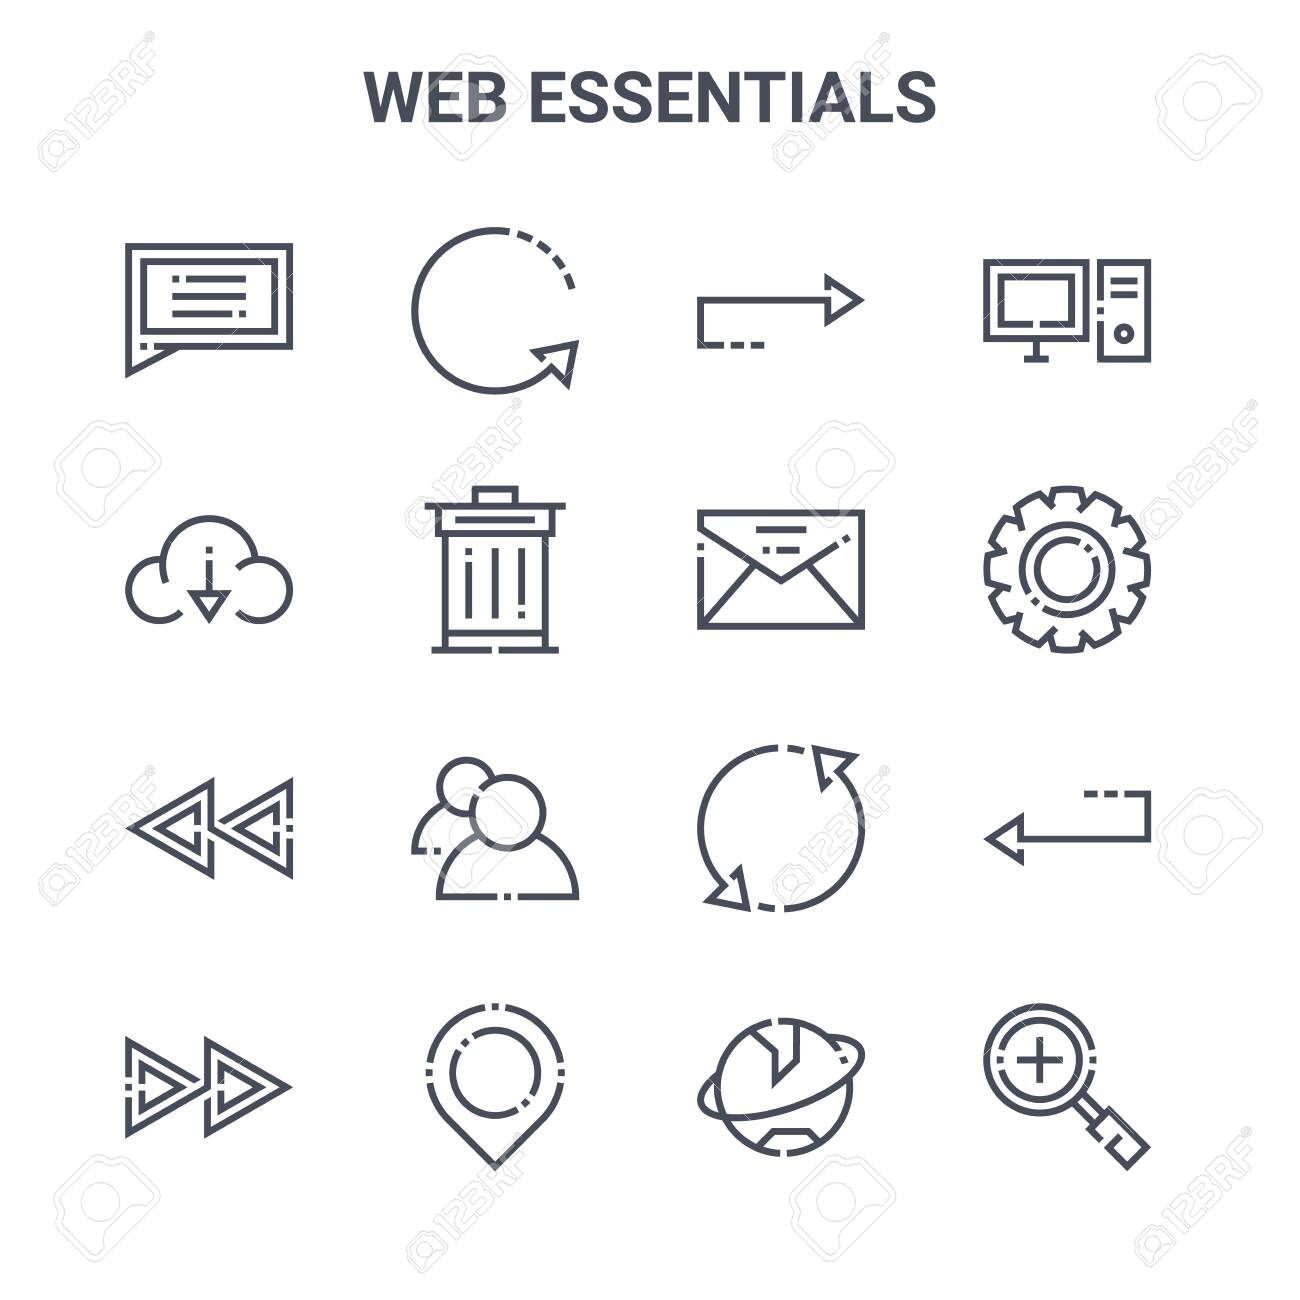 set of 16 web essentials concept vector line icons. - 152977287